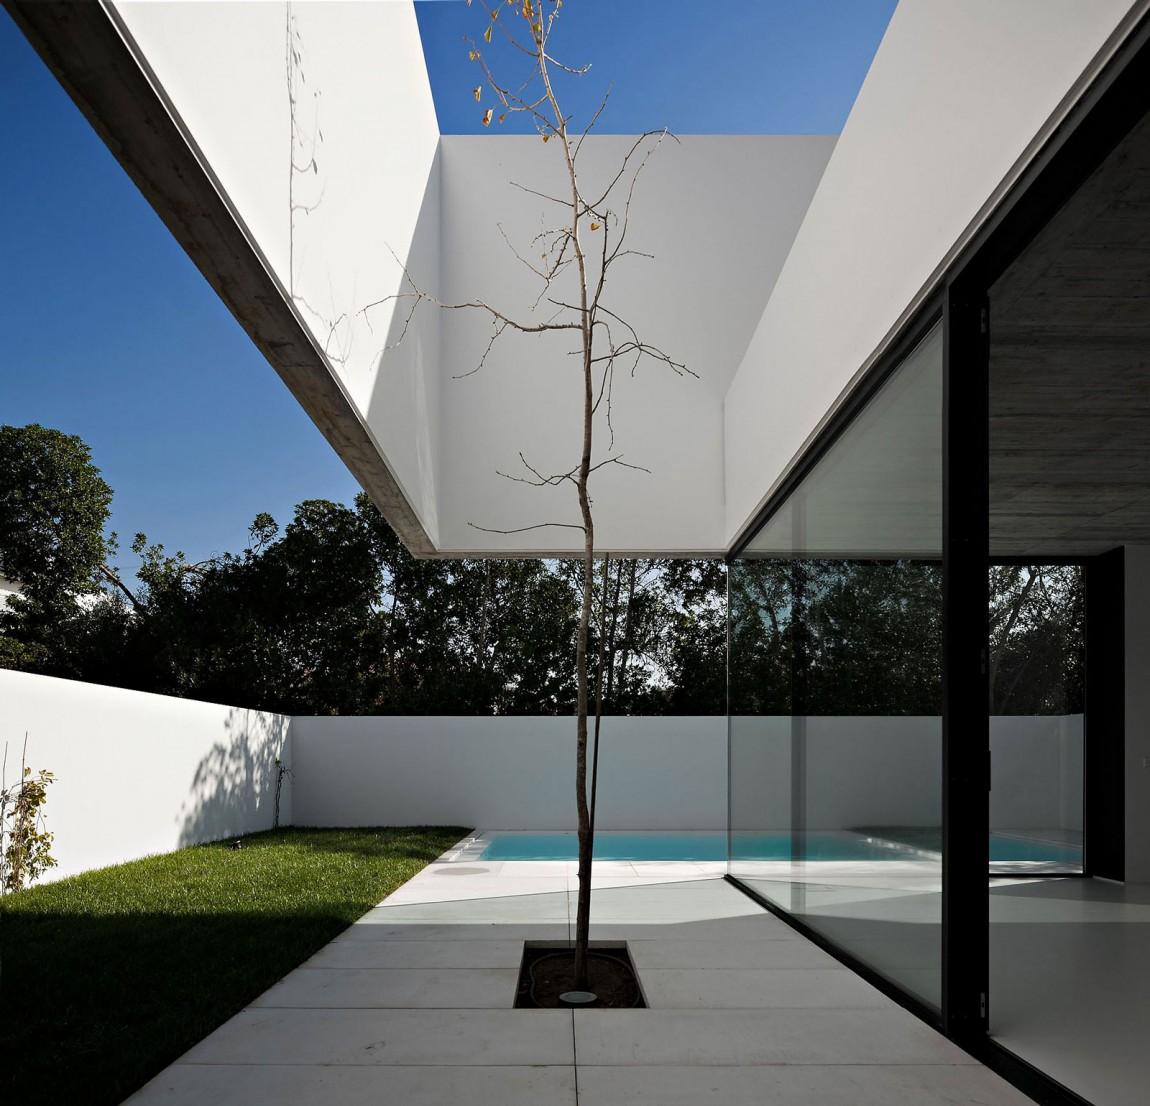 Arquitectura: Ultra Modern Minimal Architecture